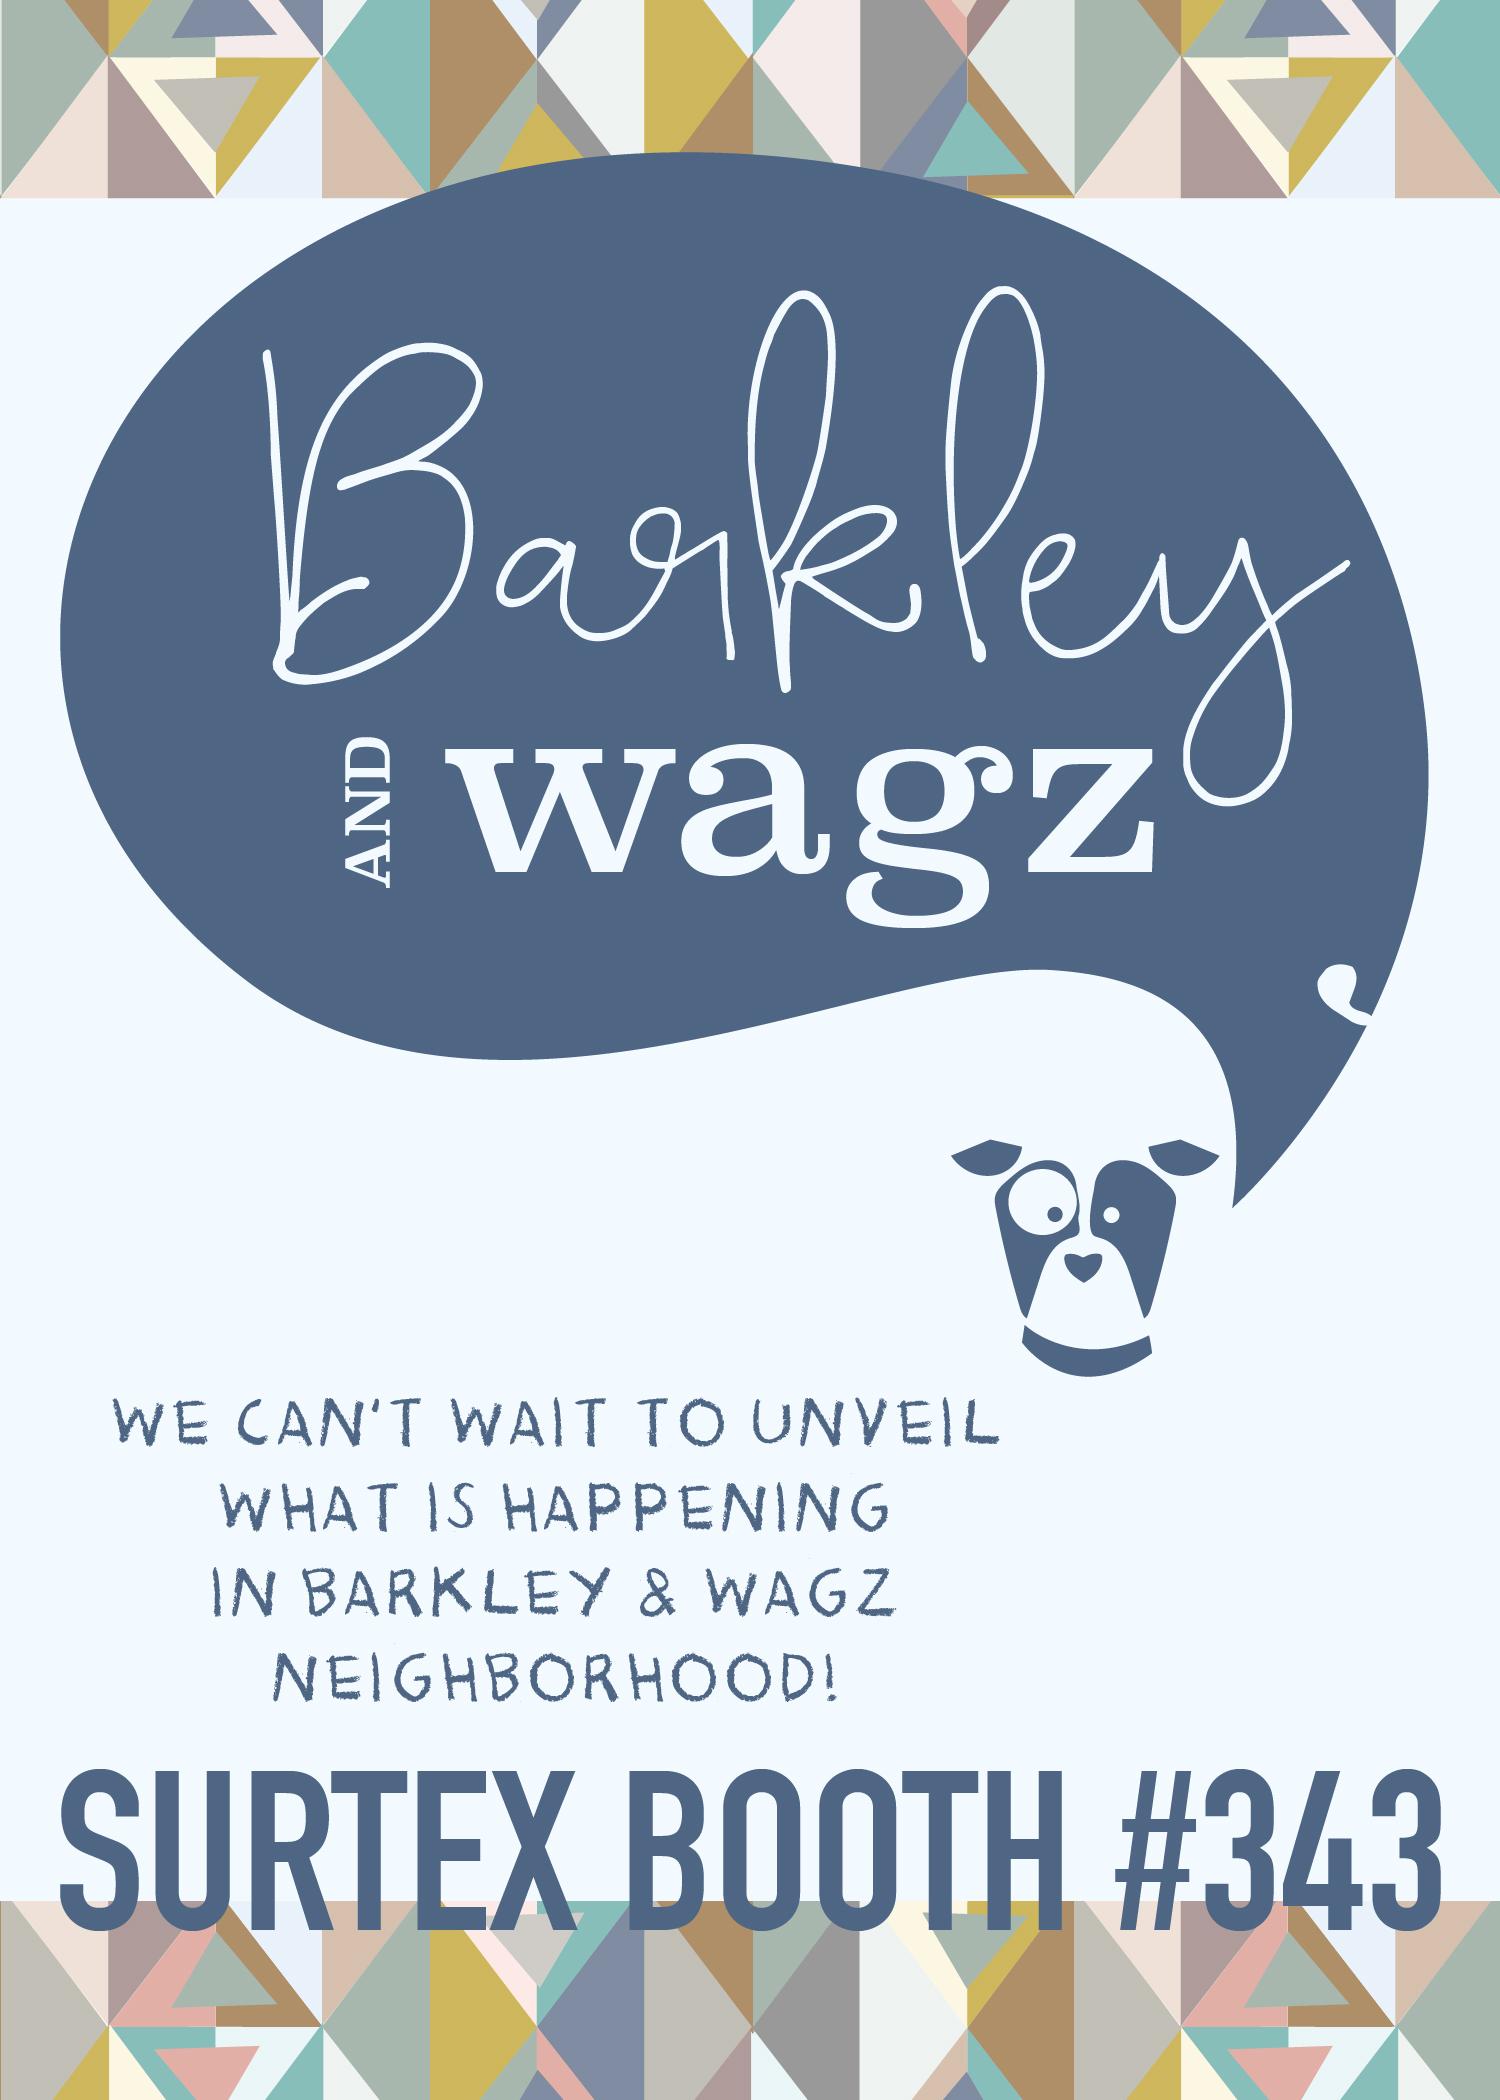 Barkley and Wagz Surtex